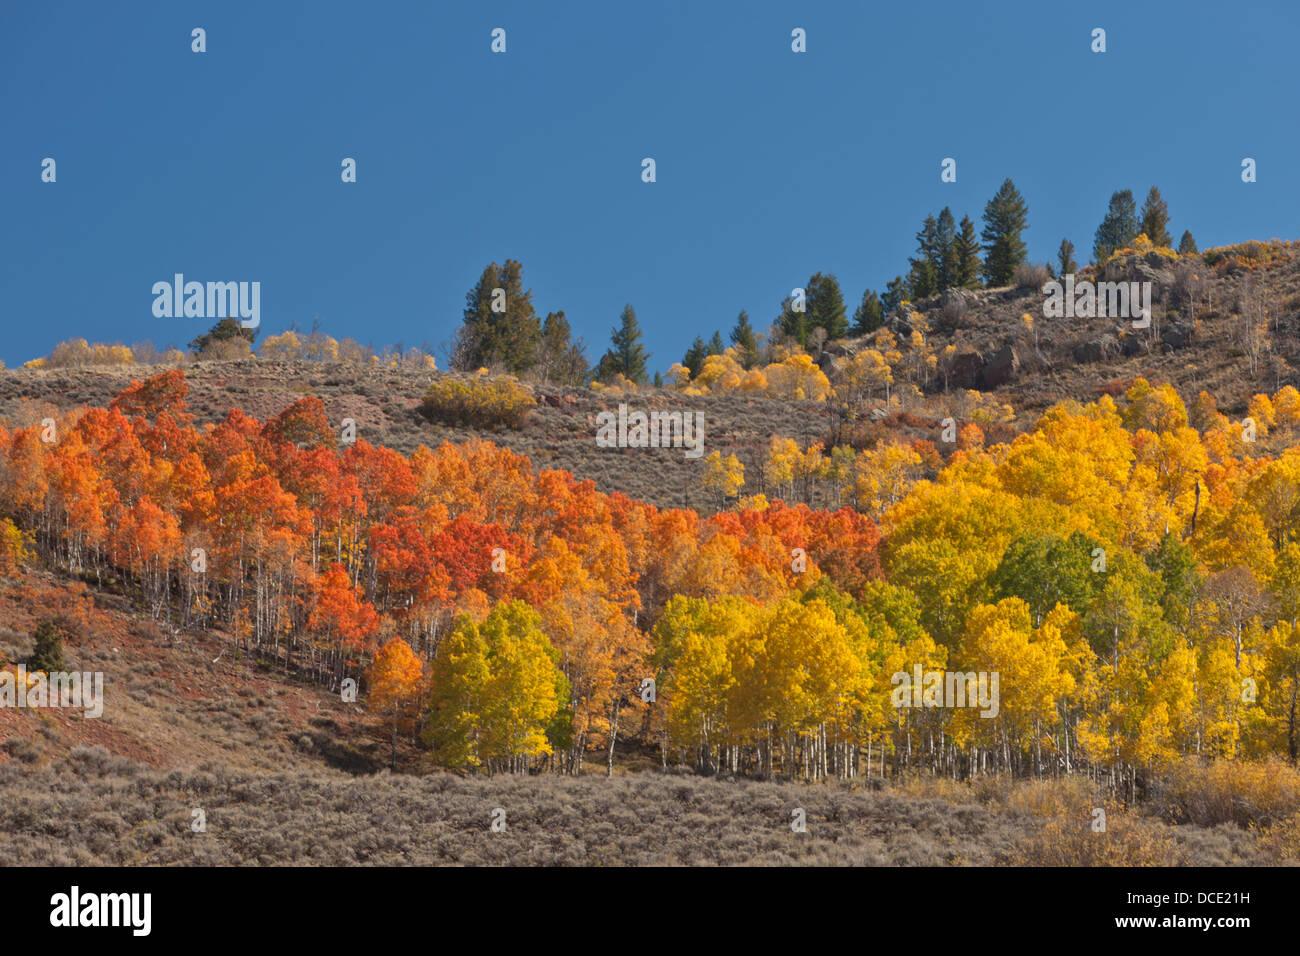 USA, Colorado. A brightly colored aspen (Populus tremuloides) grove in its peak autumn foliage - Stock Image